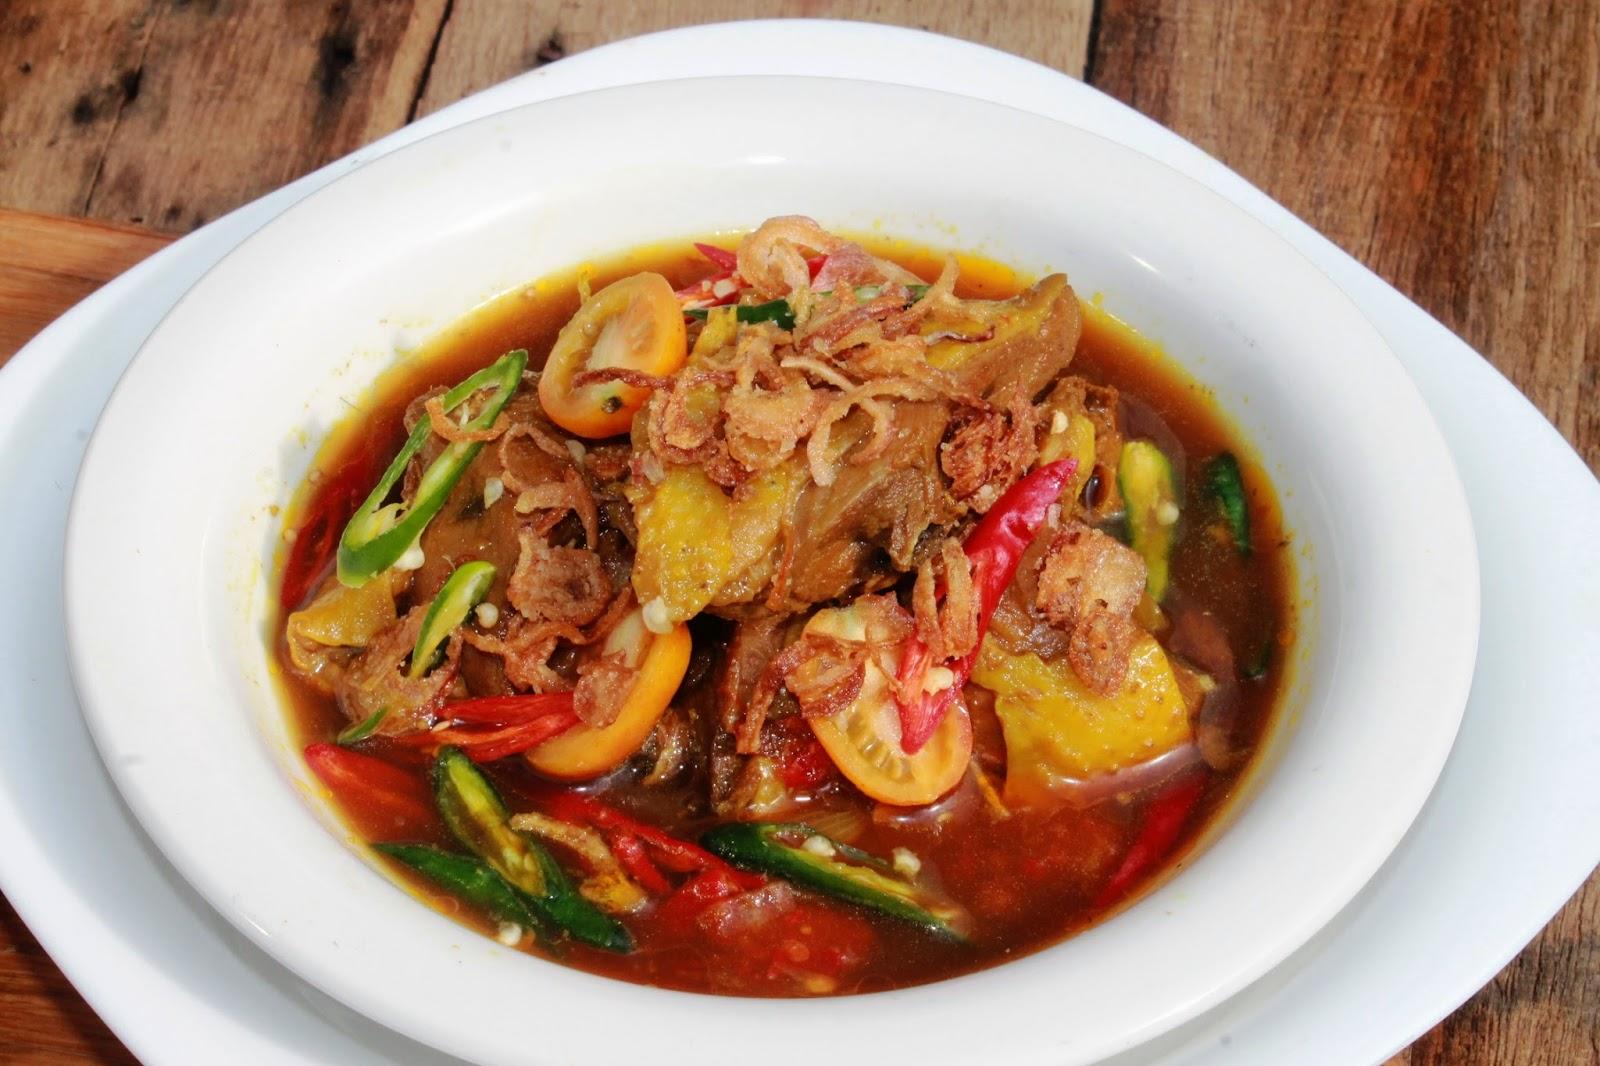 Resep Masakan Sup Ayam Thailand dengan Santan